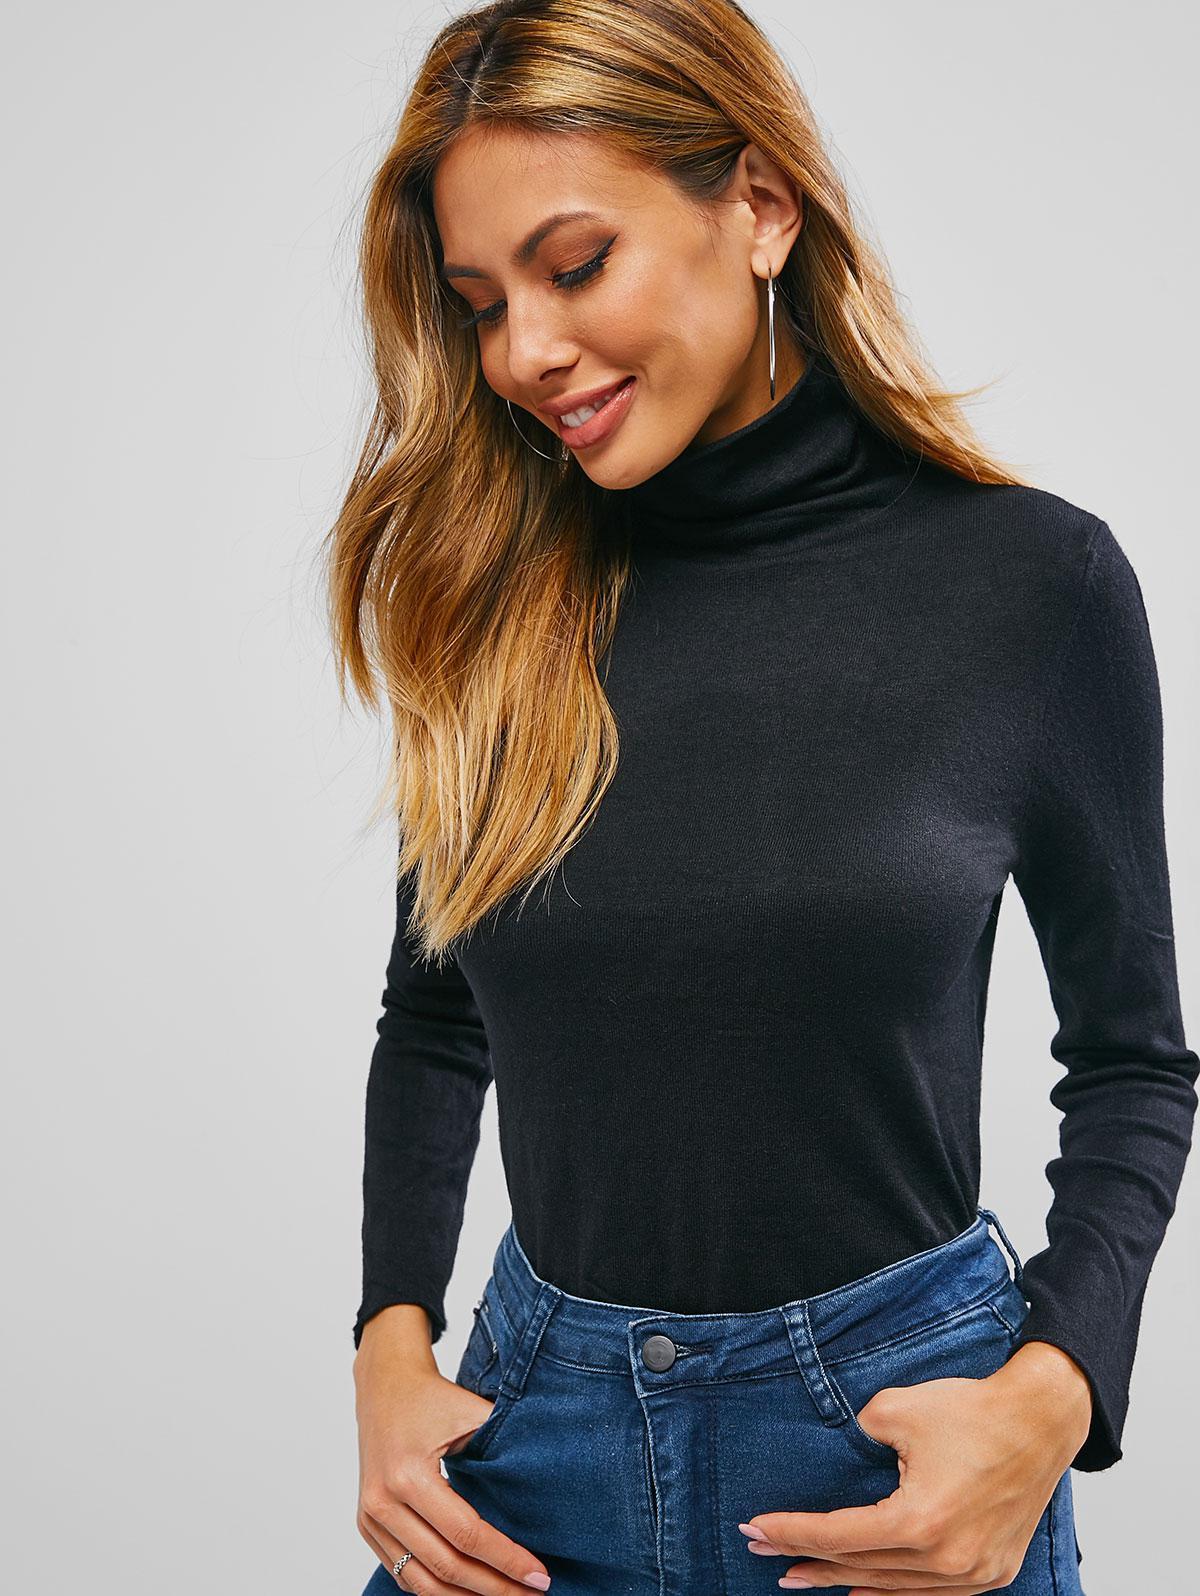 Turtleneck Solid Color Plain Knit Sweater